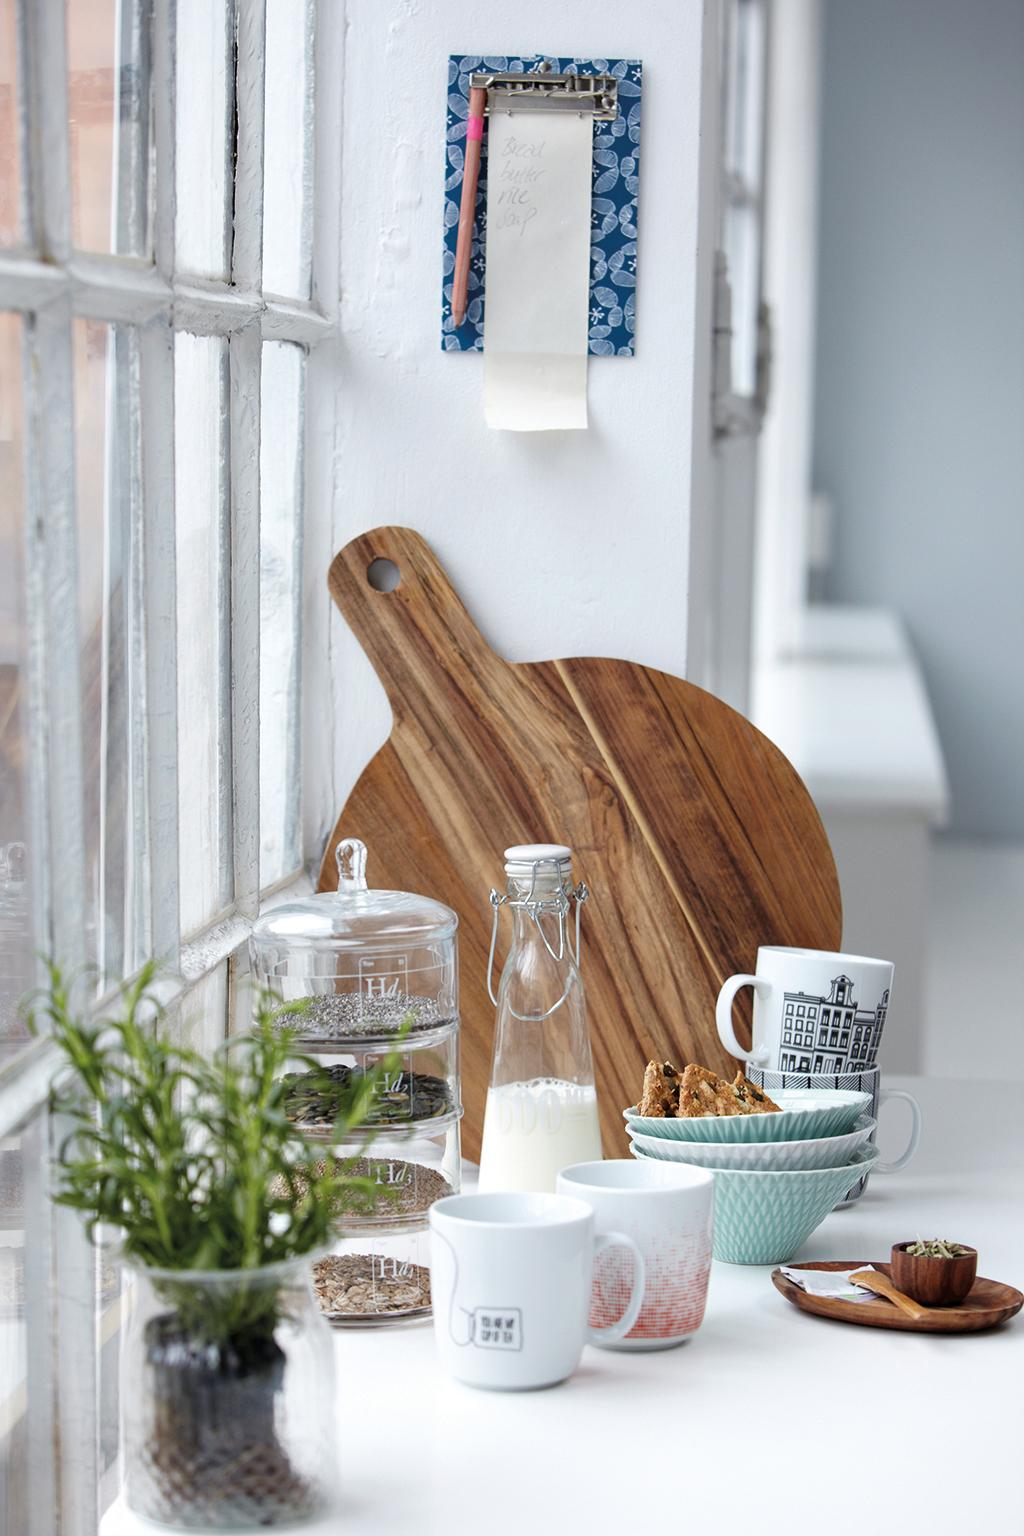 Akcesoria do kuchni nie tylko skandynawskiej north south home blog Dr house sklep